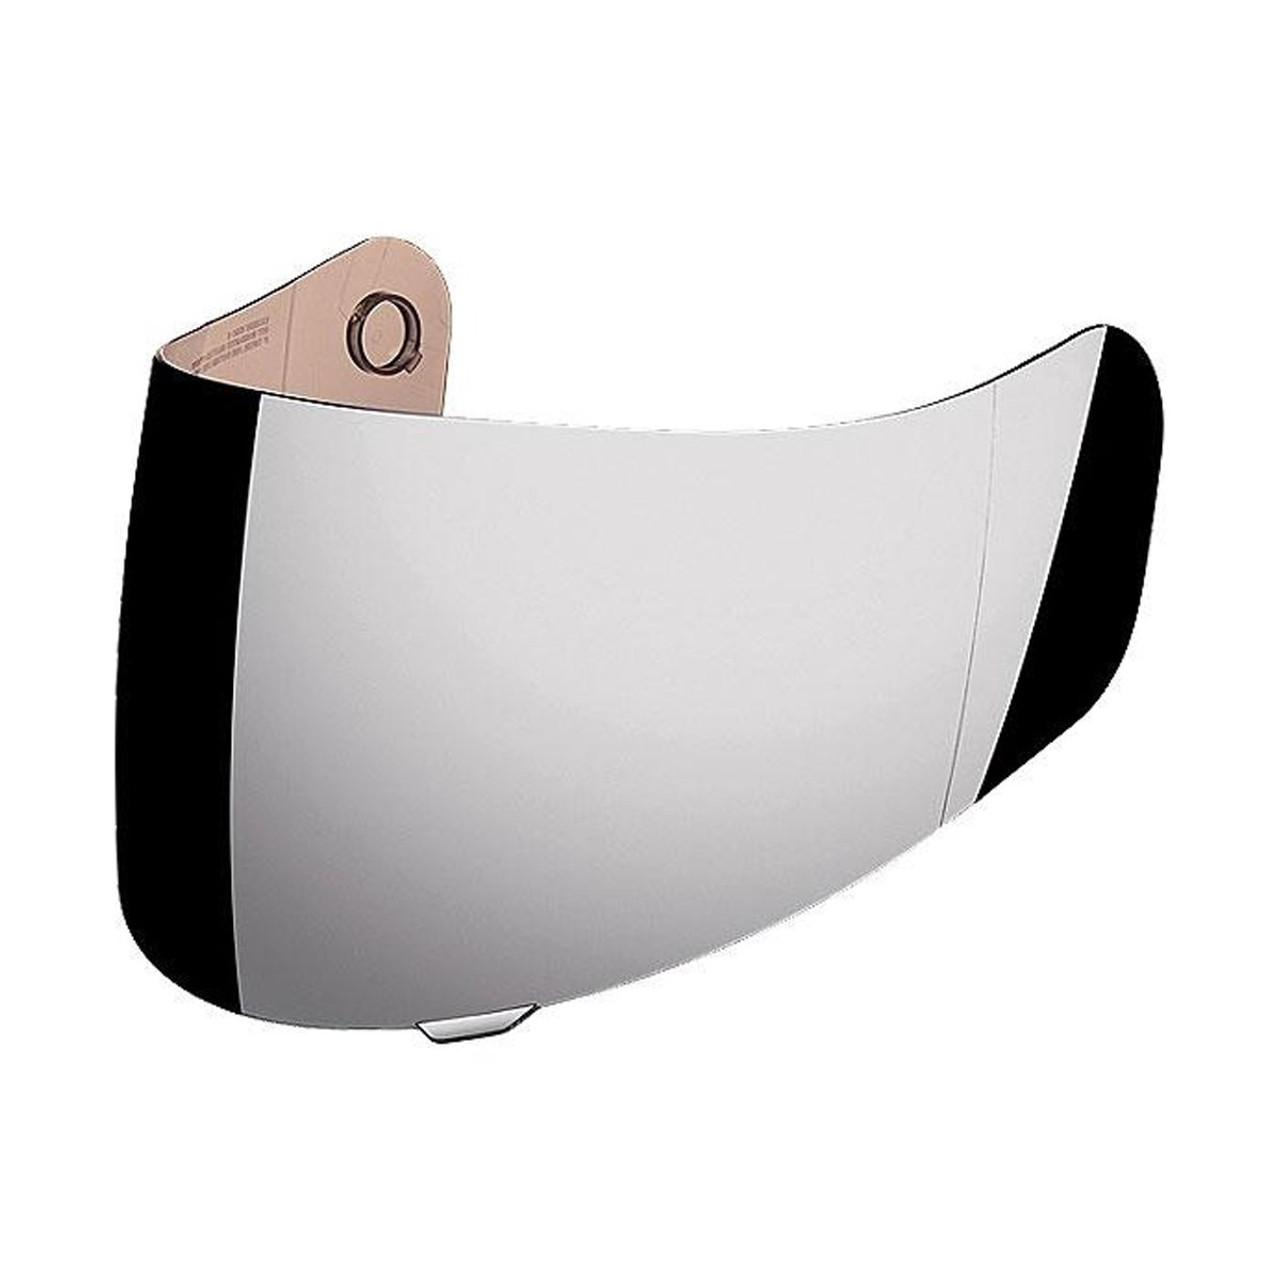 HJC HJ-20 Clear Shield for RPHA-10 RPS-10 Helmets Pinlock Ready